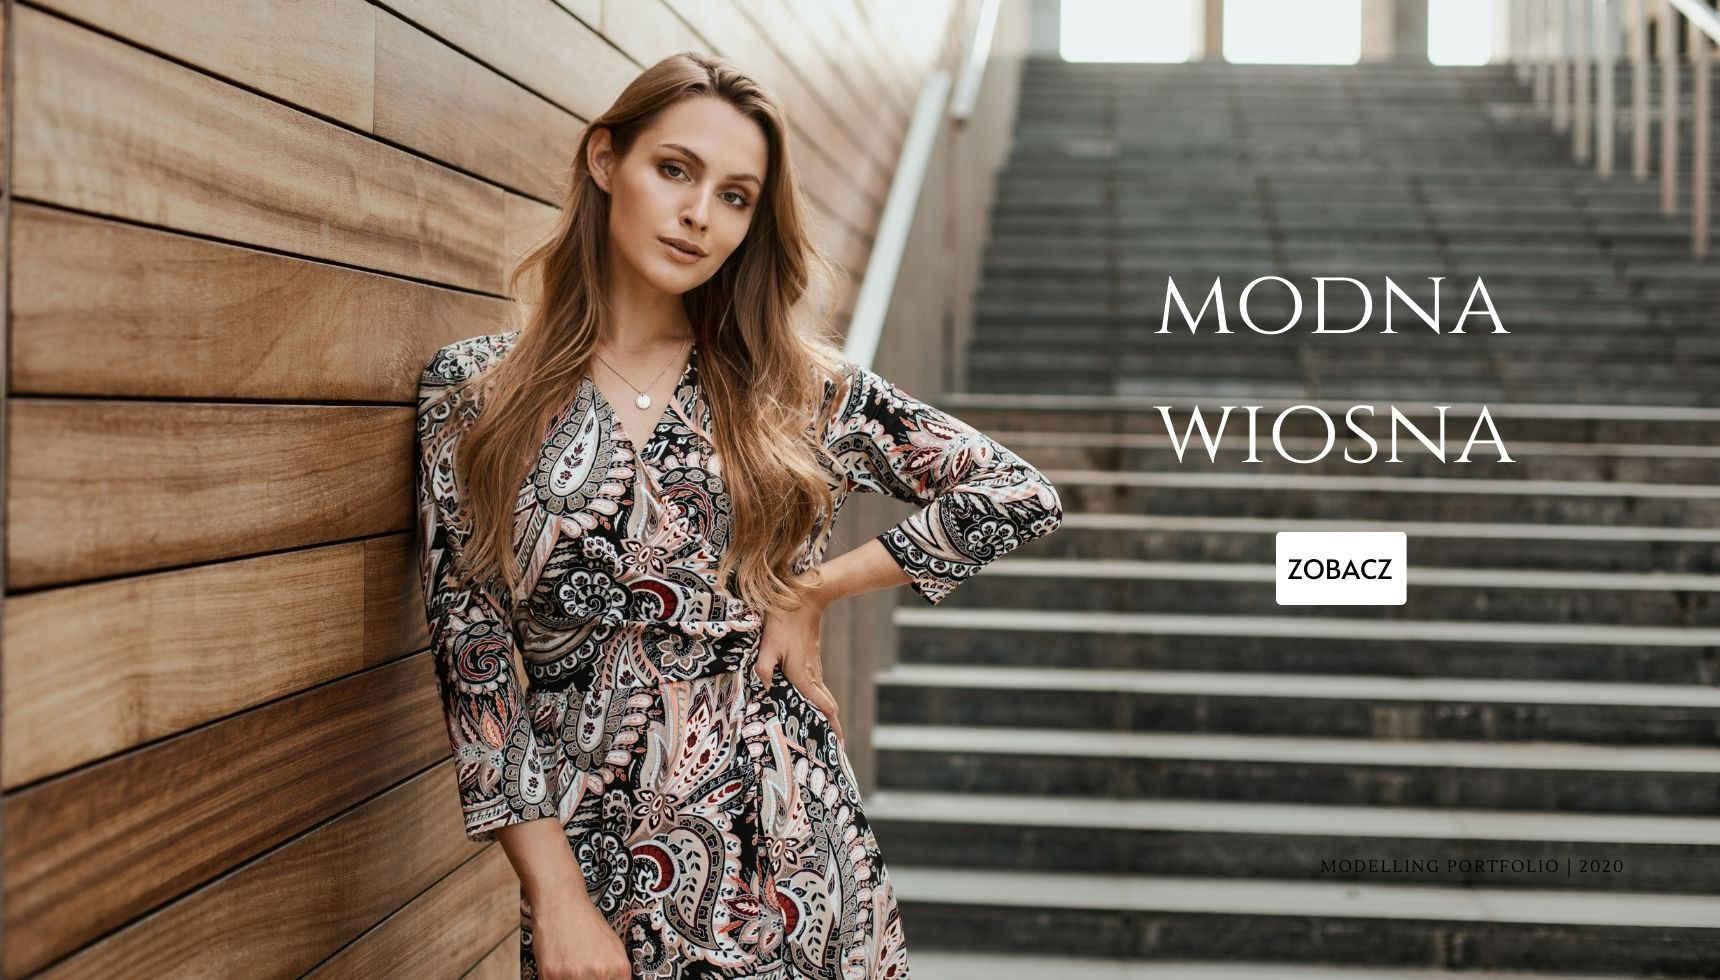 elegancka odzież damska wiosna 2021 - polska marka Vito Vergelis - moda damska